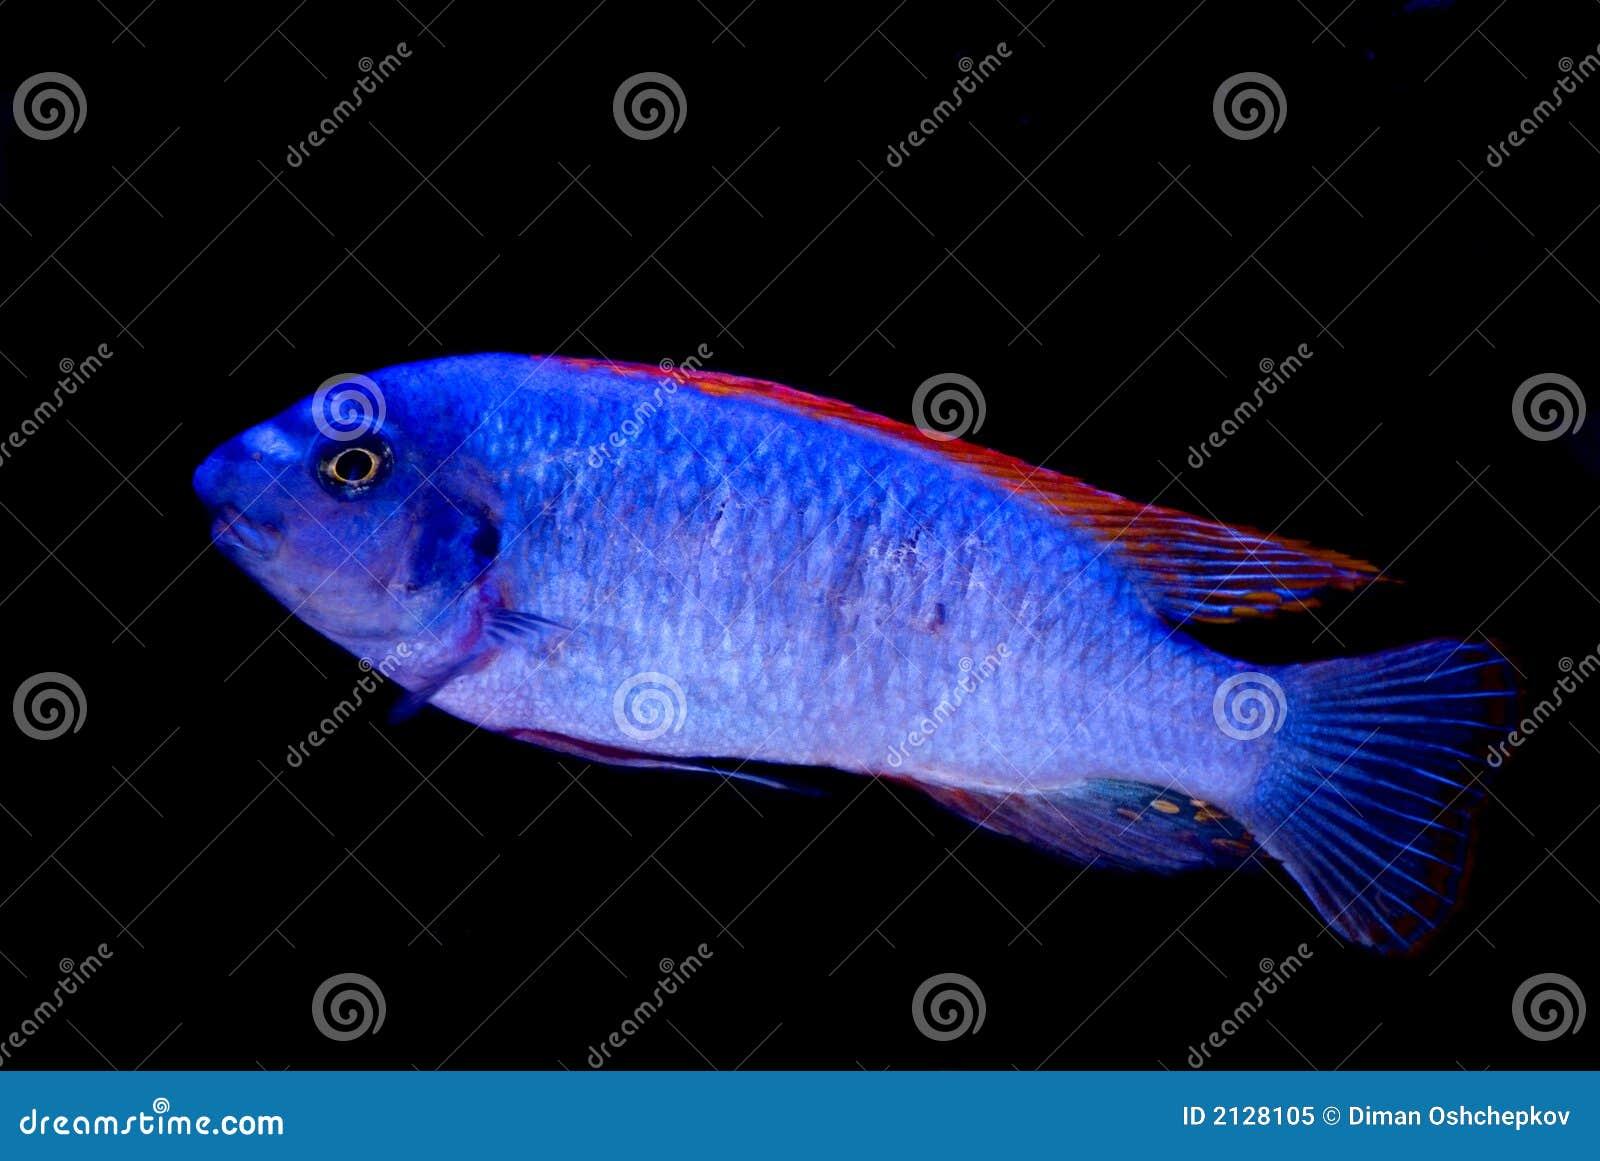 Blue fish red fish